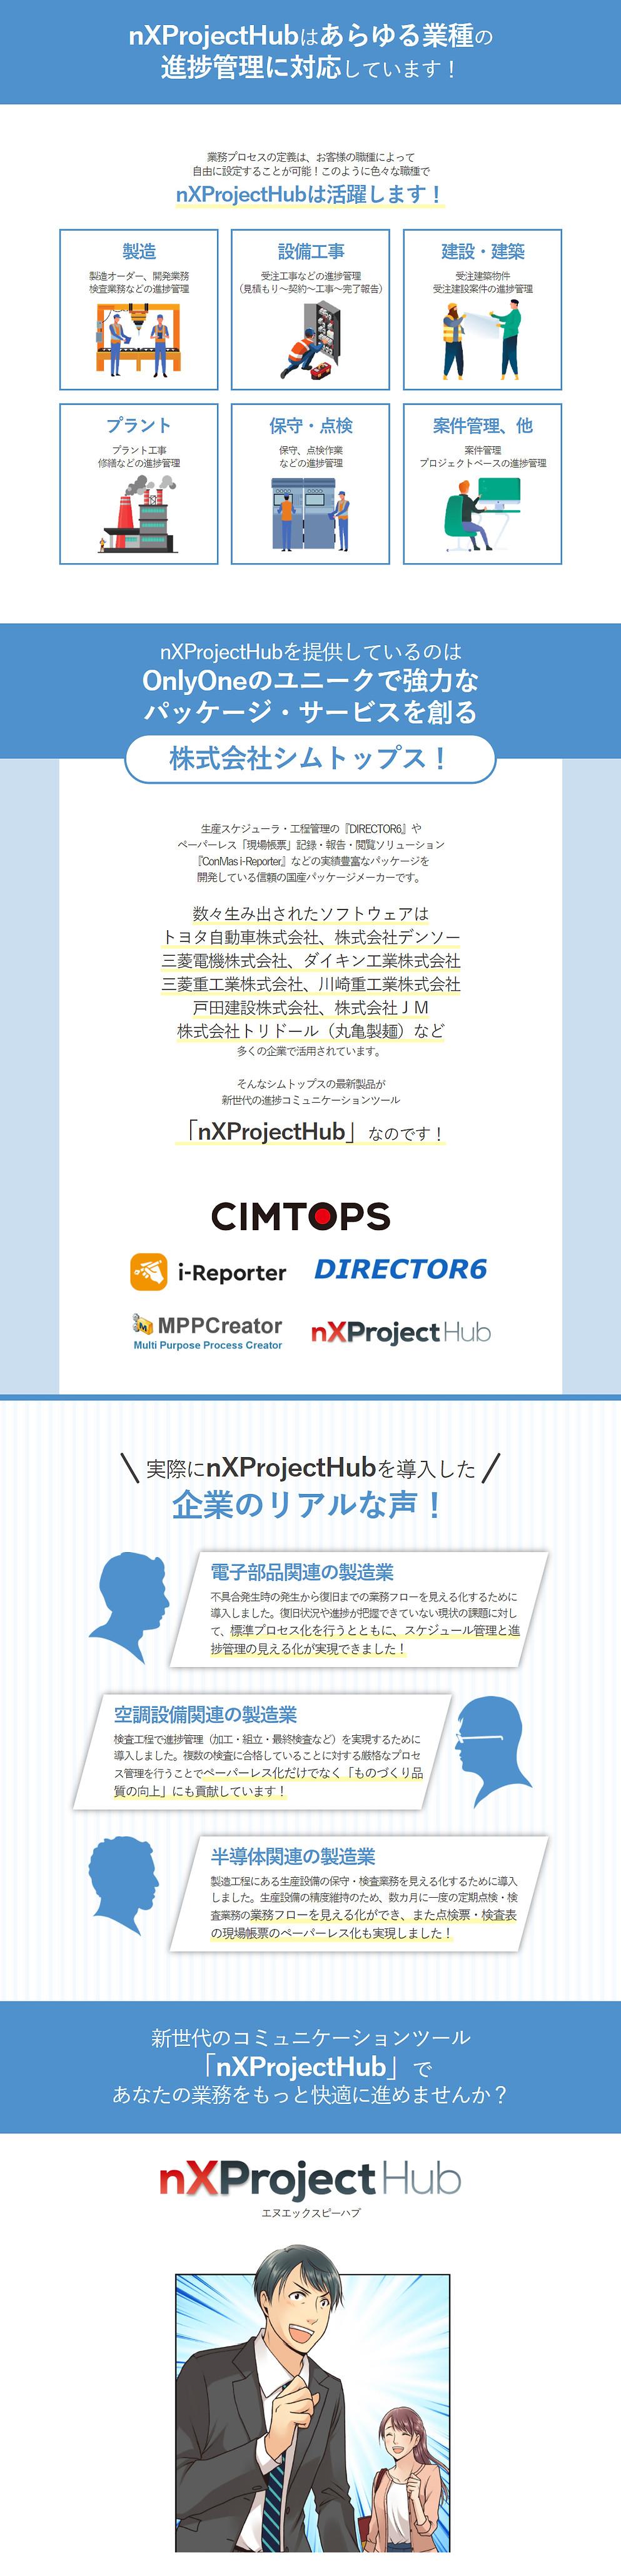 nXProjectHub_進捗管理ツール_マンガimg4